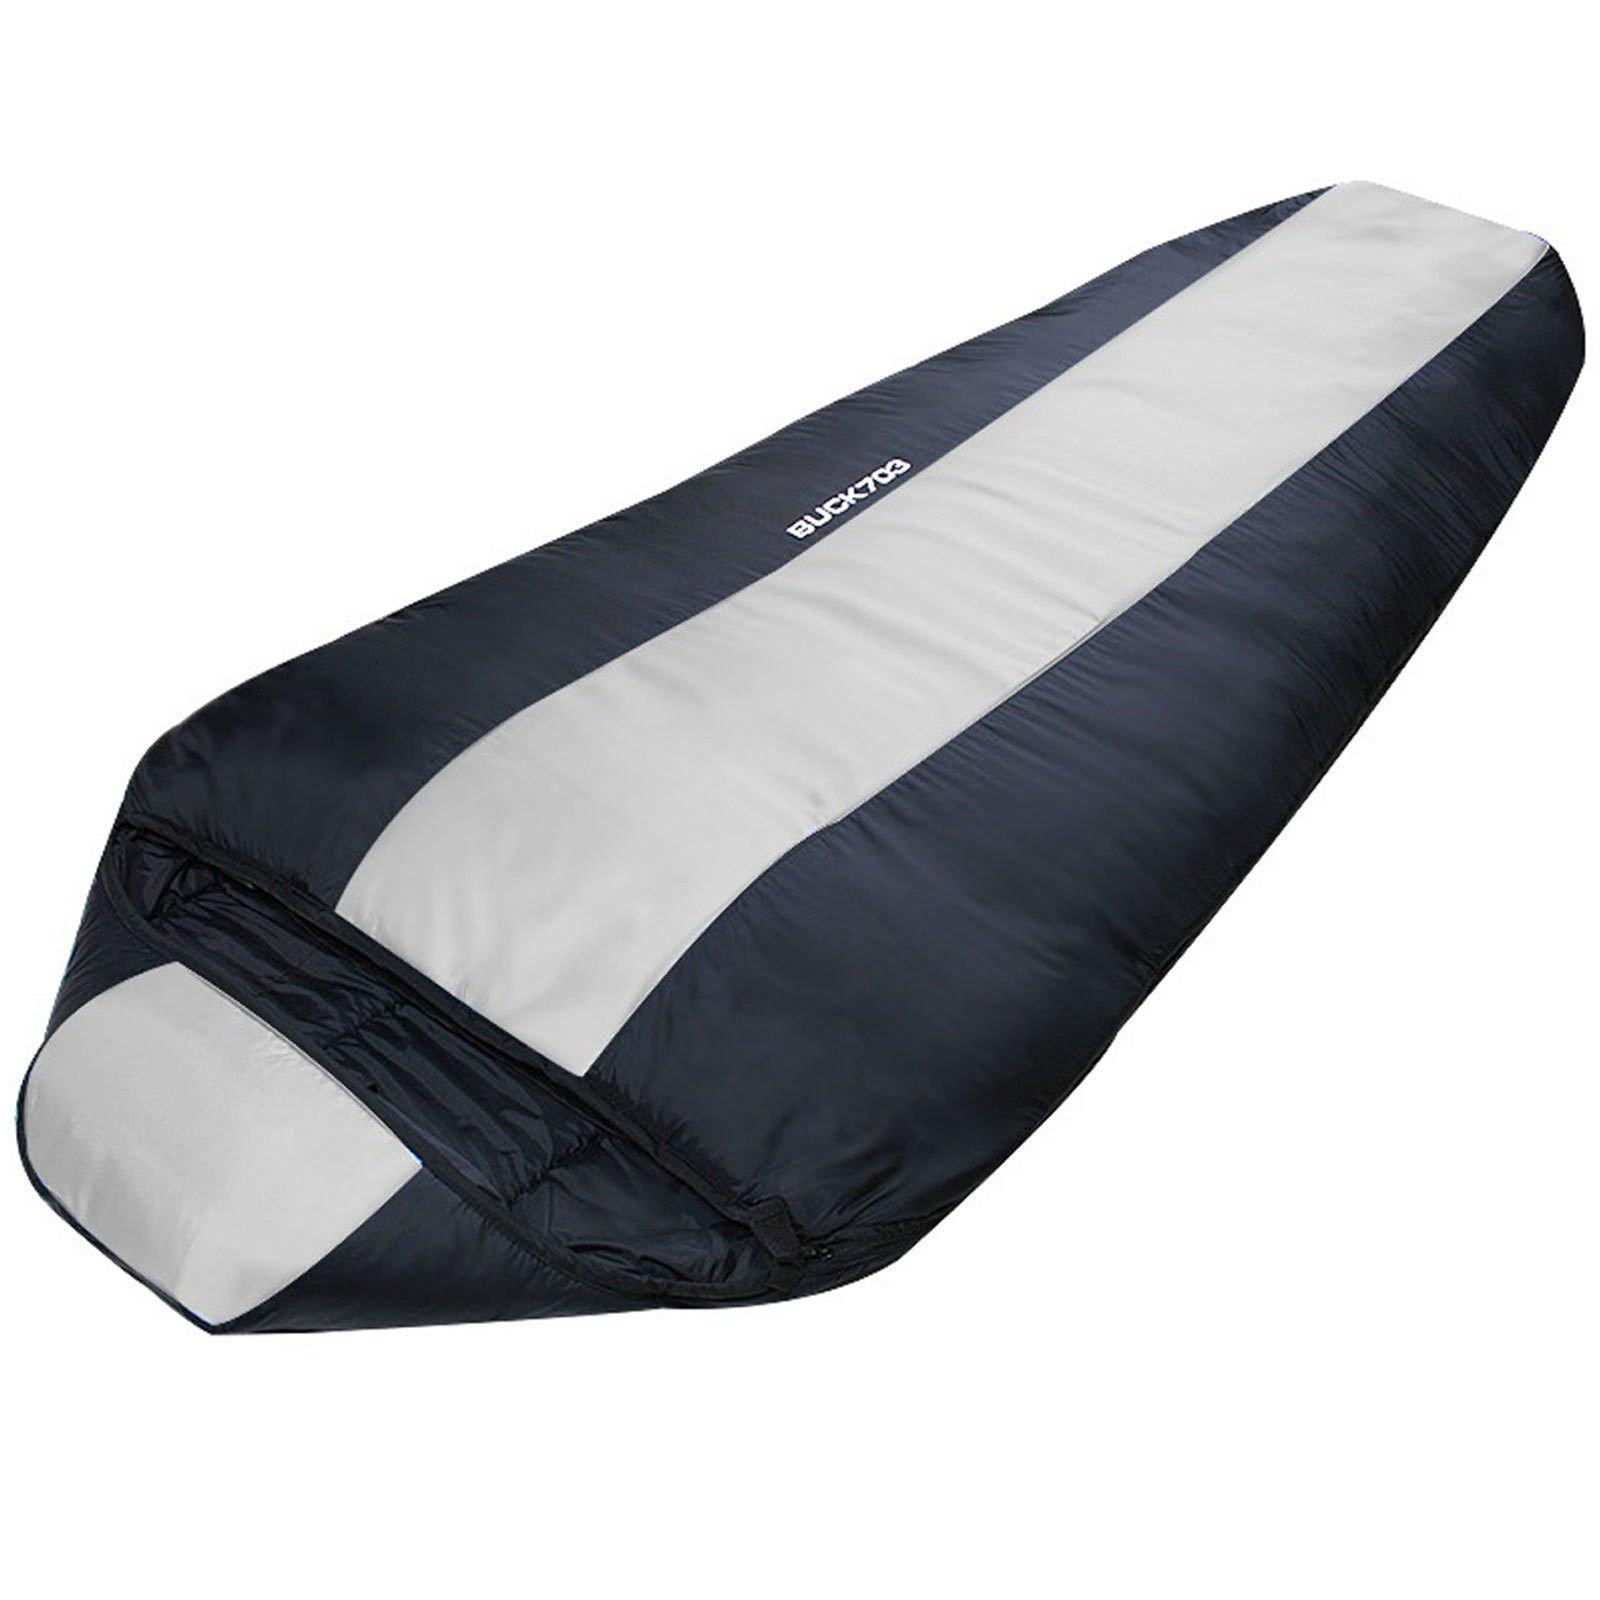 Big Sleeping Bag Large Size 225Cm Lightweight Camping Backpacking by Sleeping Bag